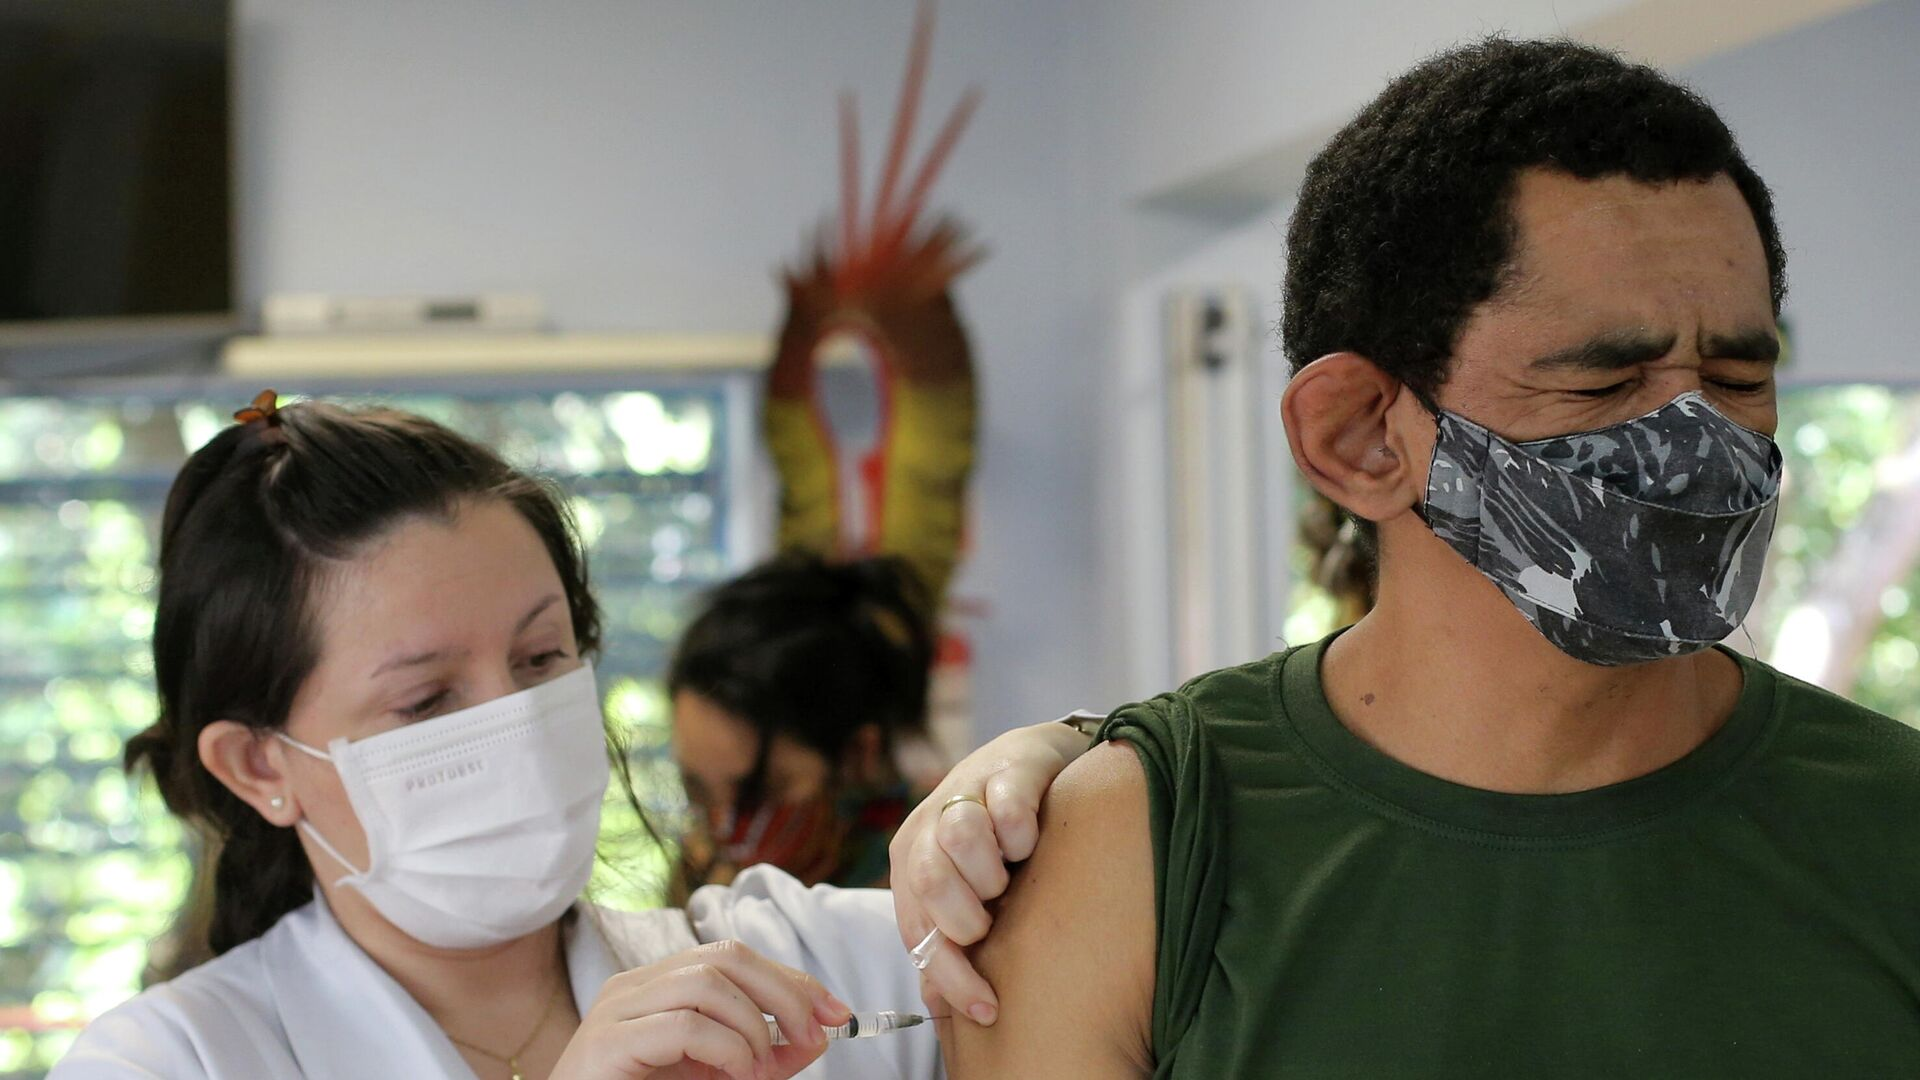 Vacunación en Brasil - Sputnik Mundo, 1920, 03.03.2021